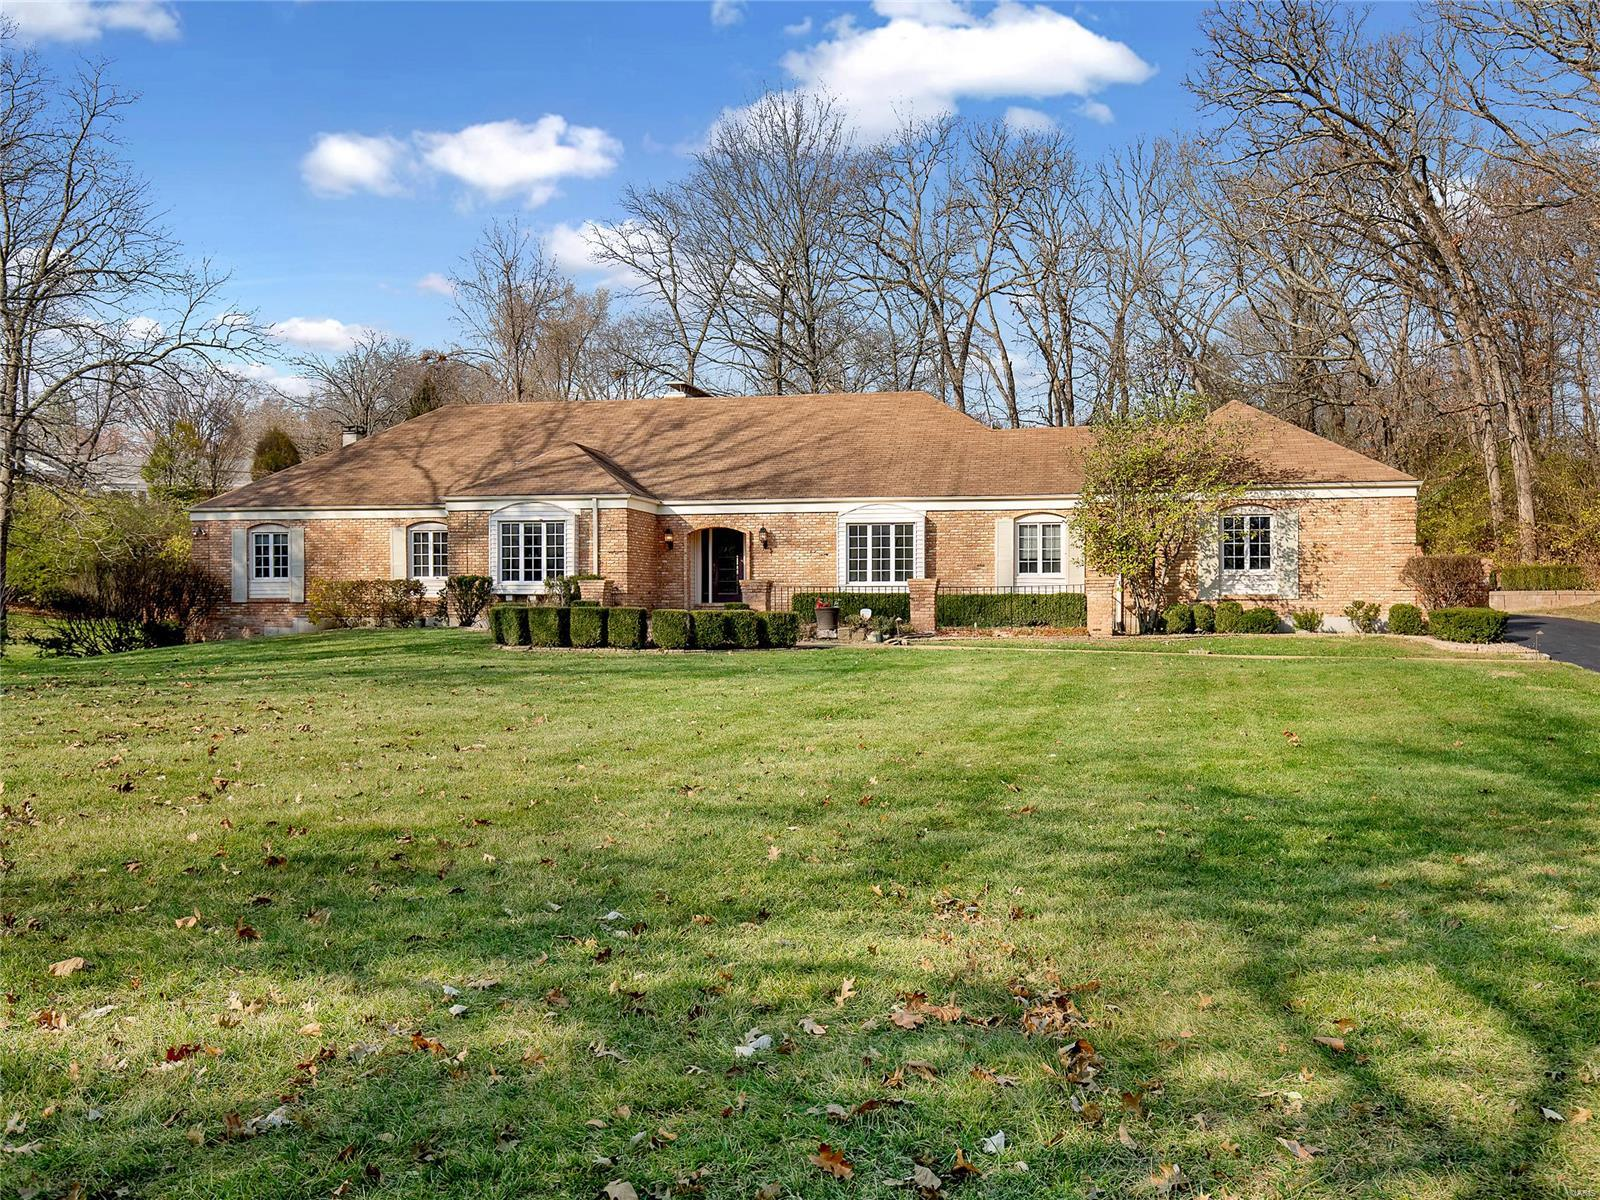 241 S Graeser Property Photo - Creve Coeur, MO real estate listing